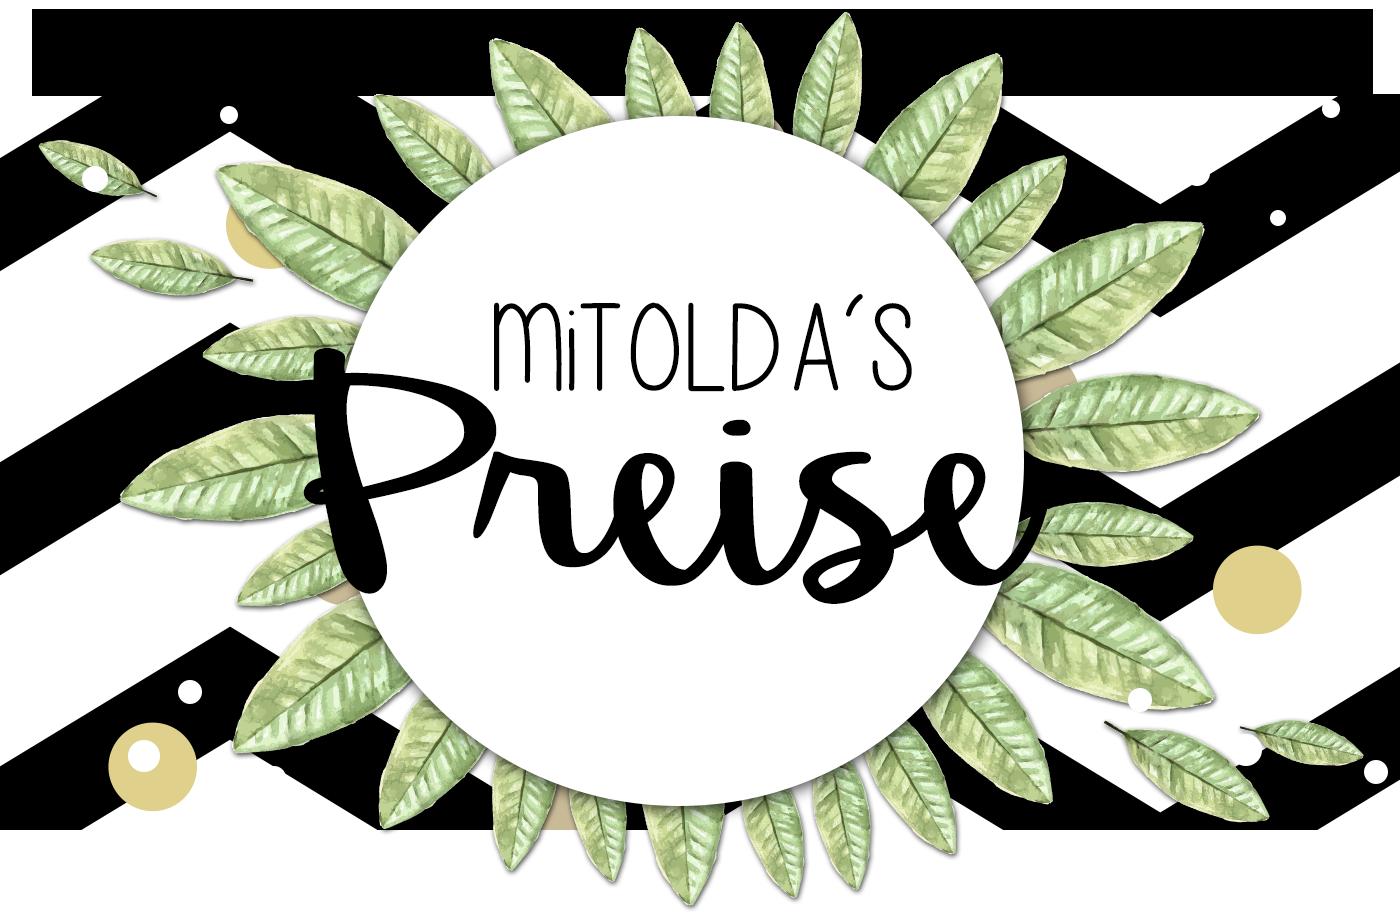 Mitolda's Preise